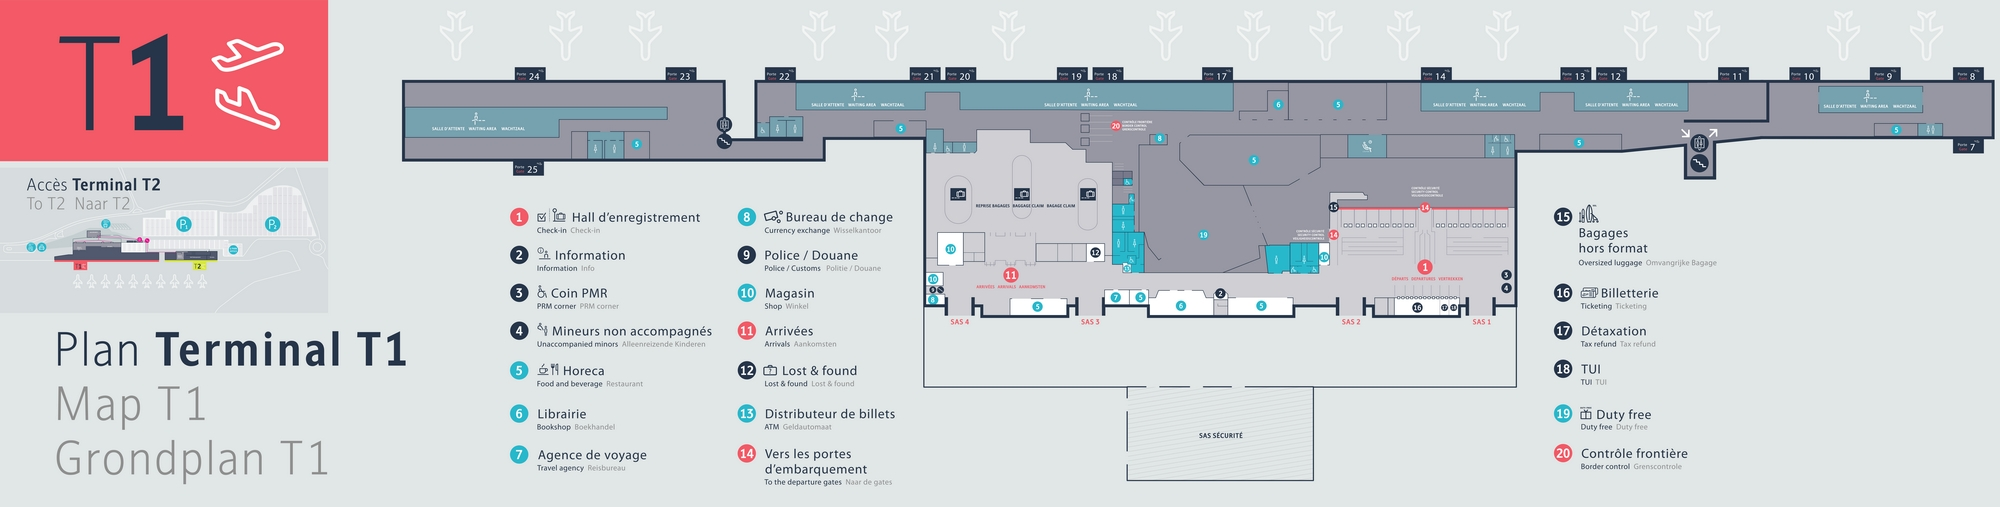 Схема терминалов аэропорта Шарлеруа: Т1